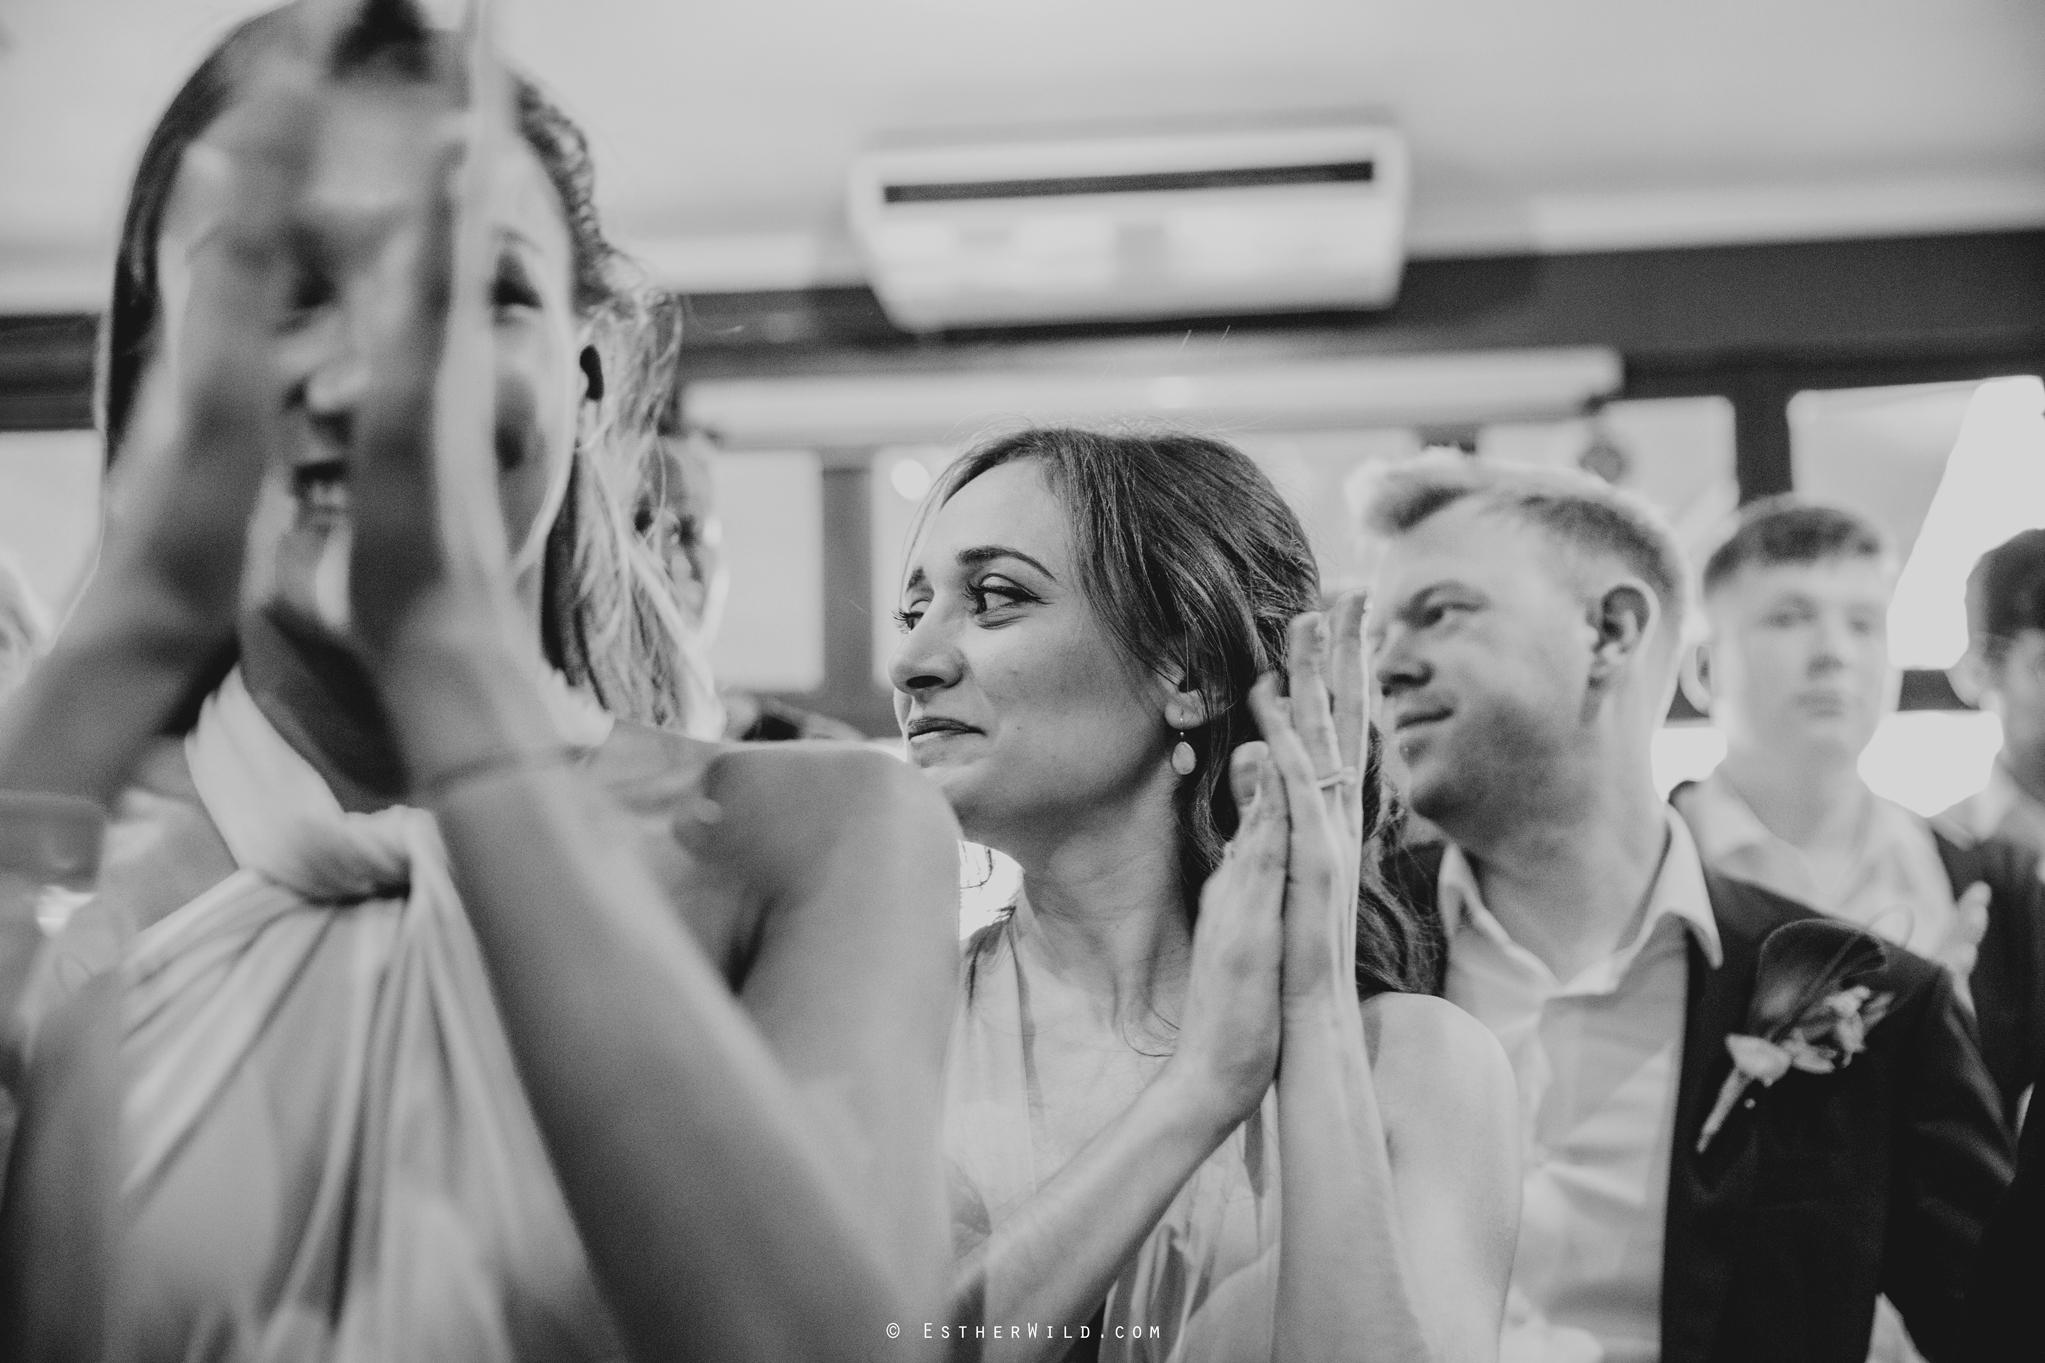 Islington_Town_Hall_Wedding_London_Photographer_Esther_Wild_IMG_5910-1.jpg